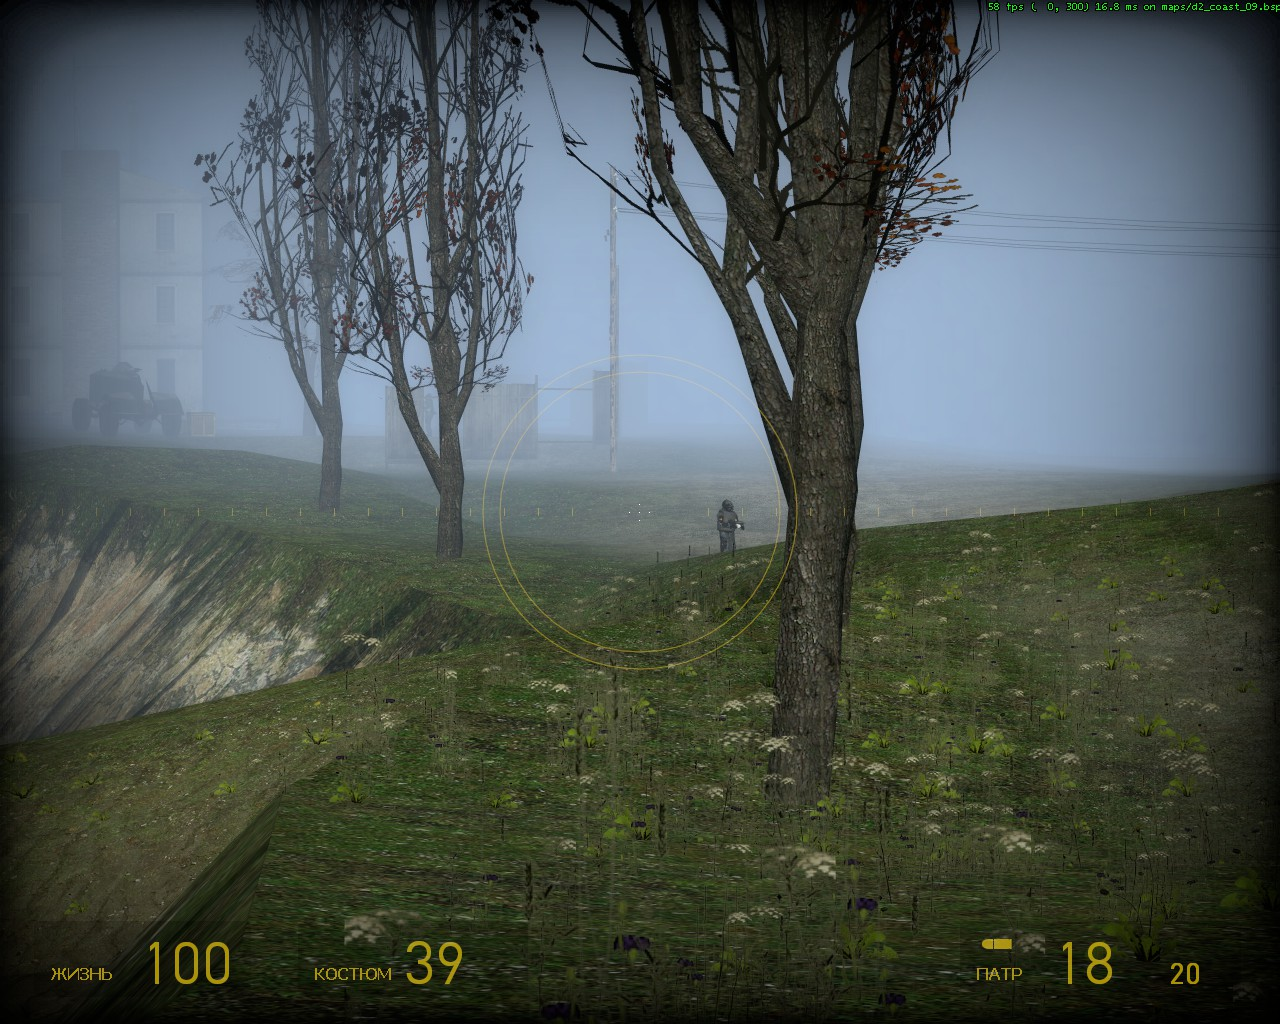 d2_coast_090005.jpg - Half-Life 2